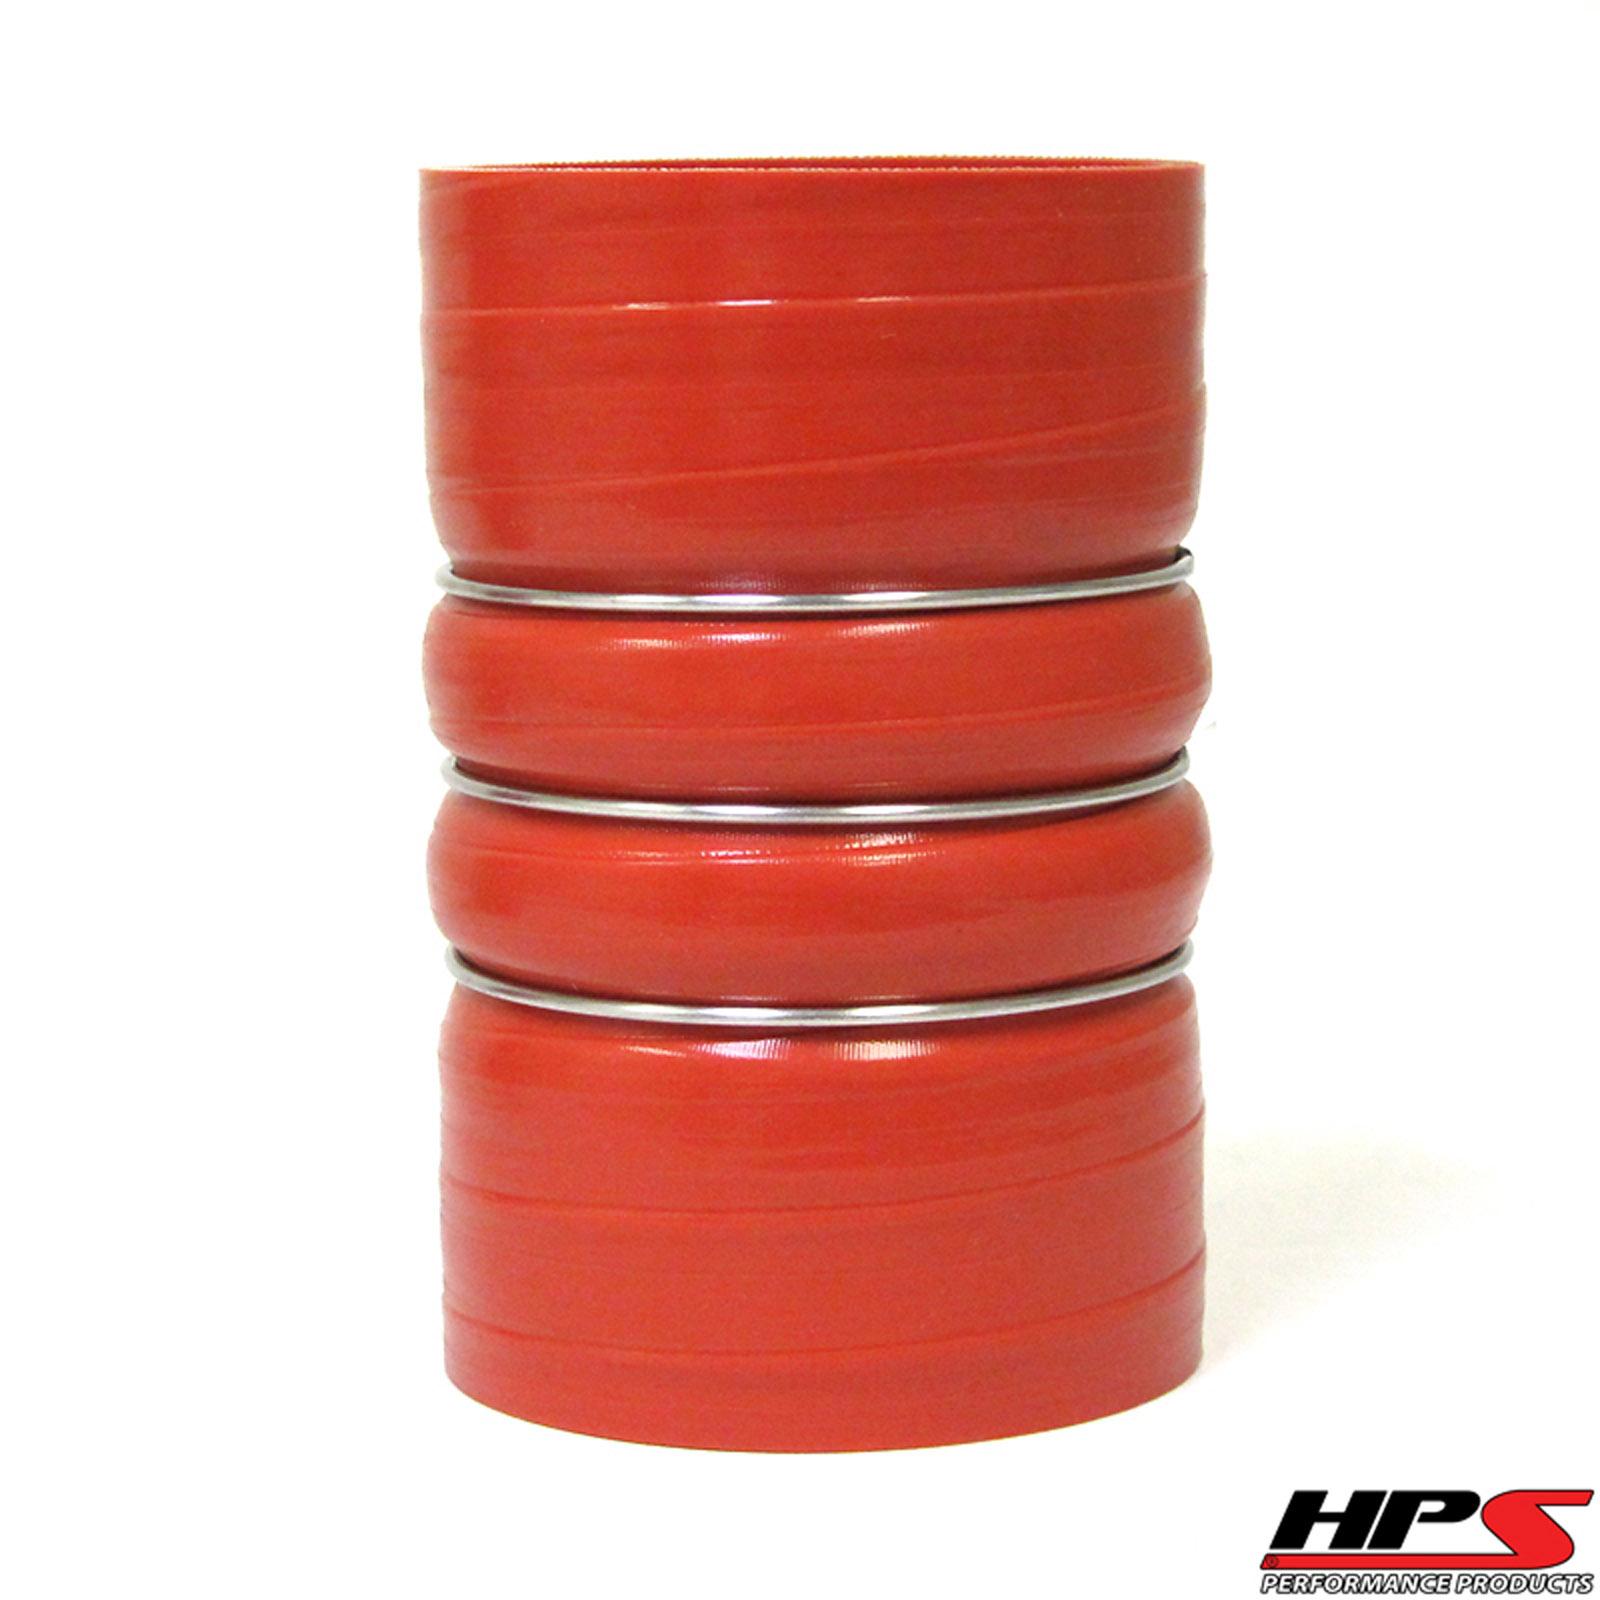 Black 3.5 x 3 Long Straight Silicone Hose Coupler Tube HPS HTST-3F-350-BLK